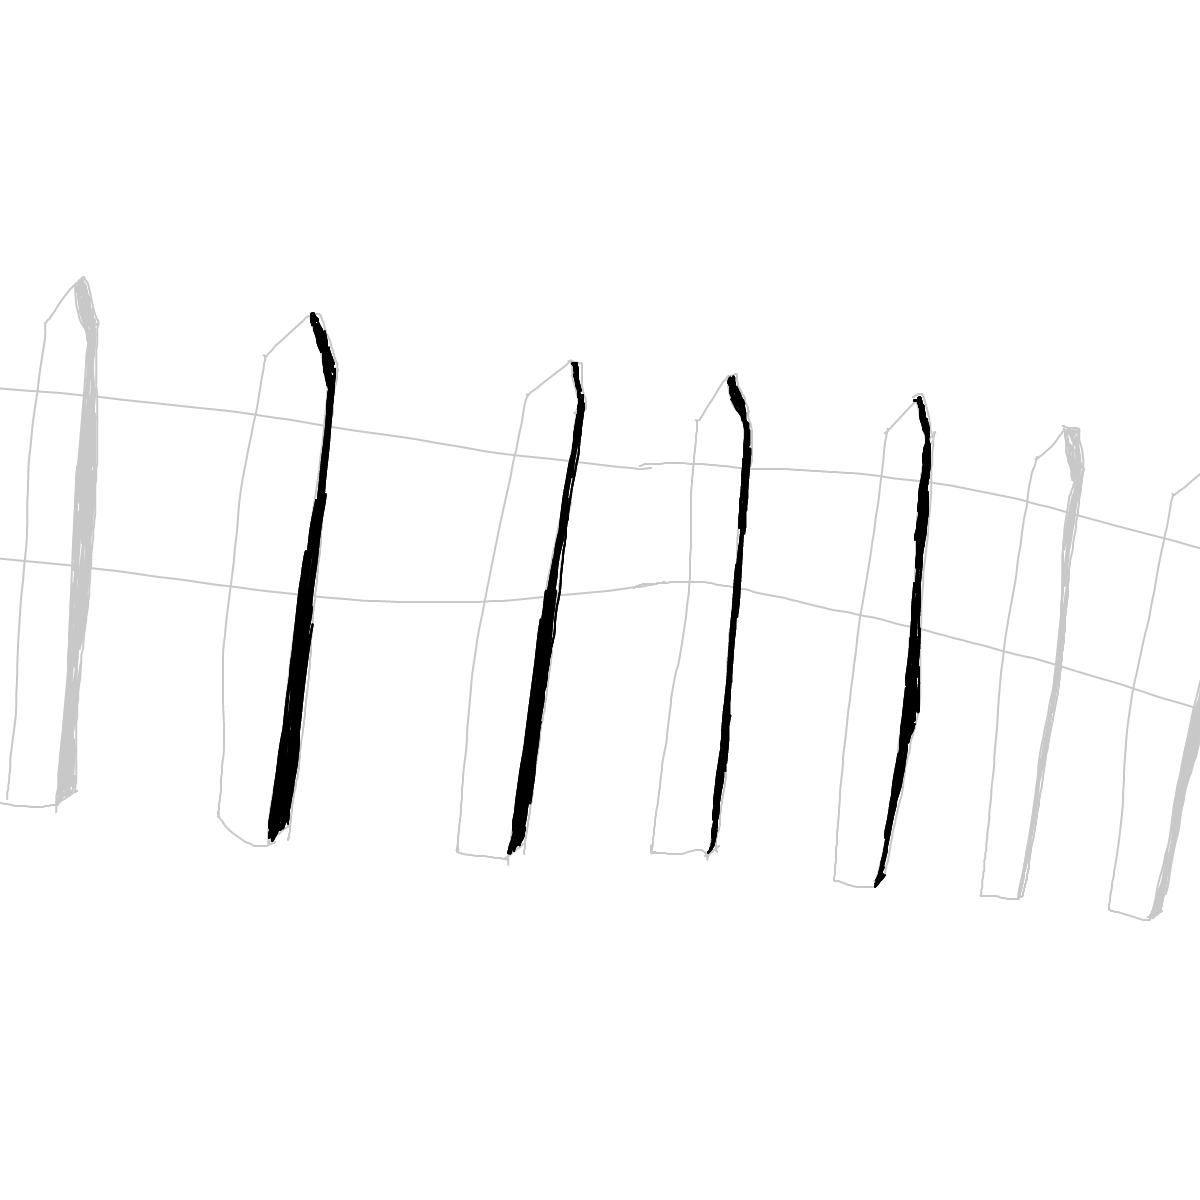 BAAAM drawing#9752 lat:52.4750709533691400lng: 13.4068040847778320